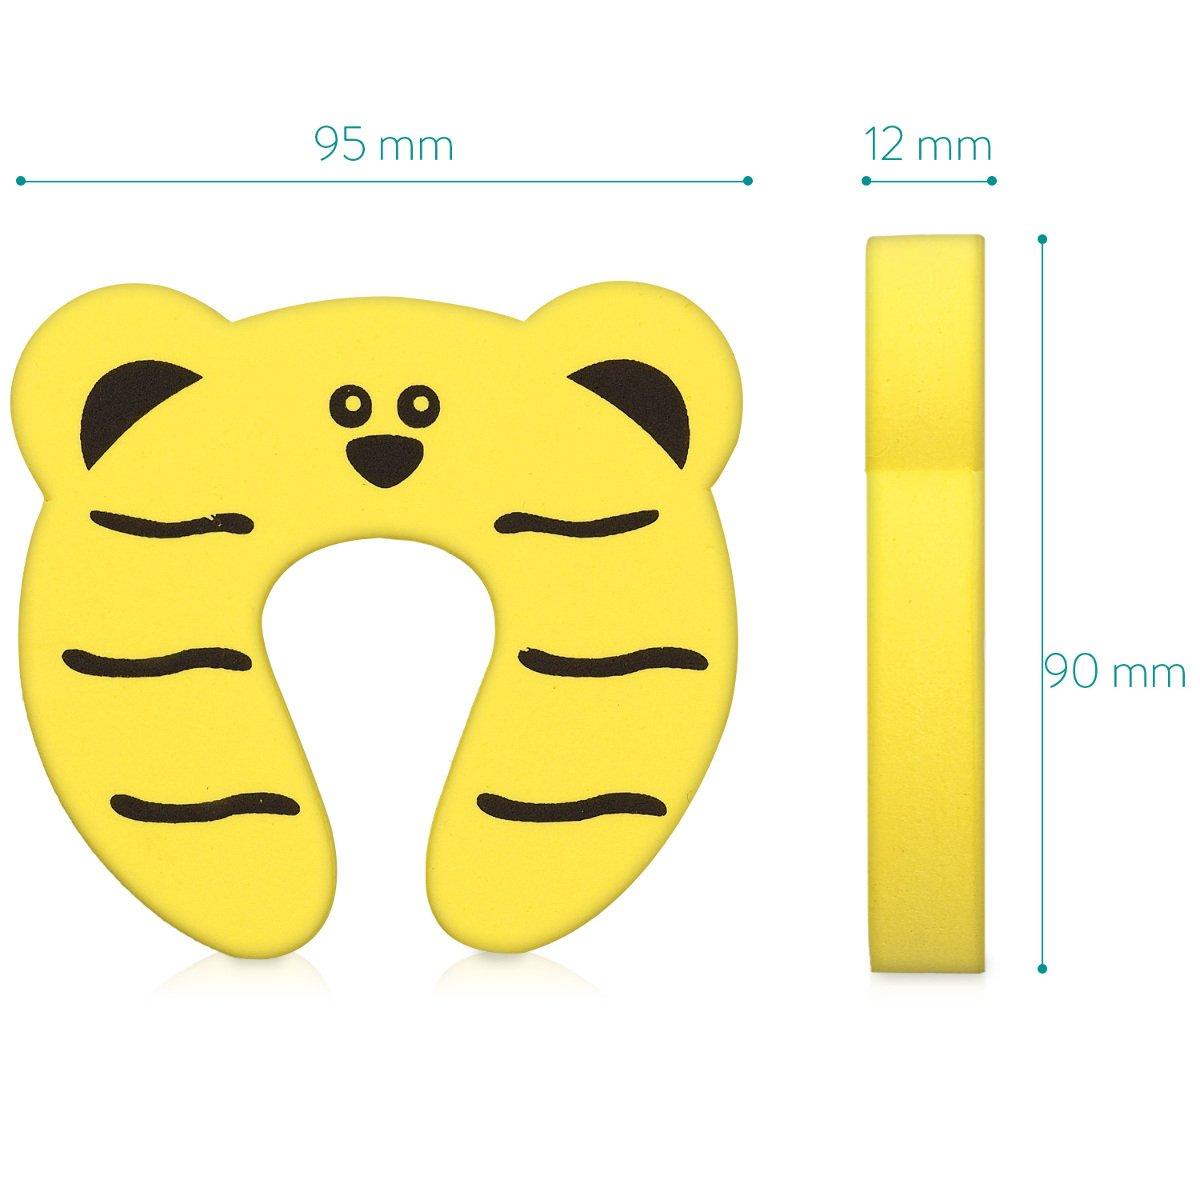 Türschutz Türpuffer Türstopper Kindersicherung Schaumstoff Finger Klemmschutz